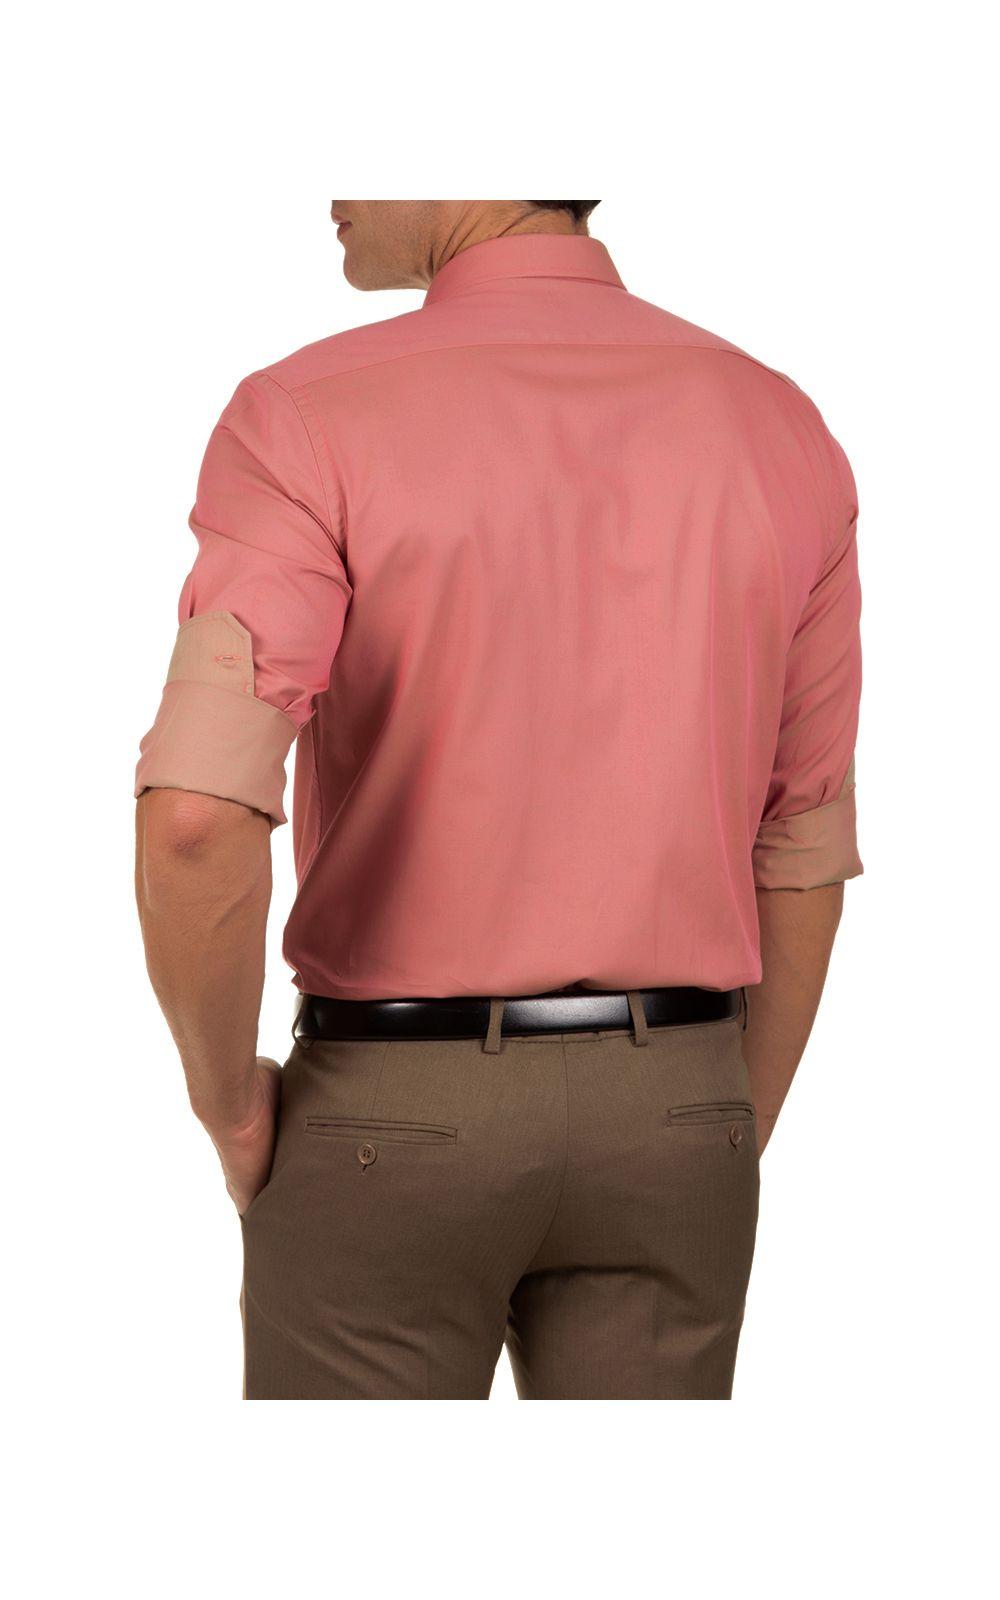 Foto 2 - Camisa Social Masculina Vermelho Lisa